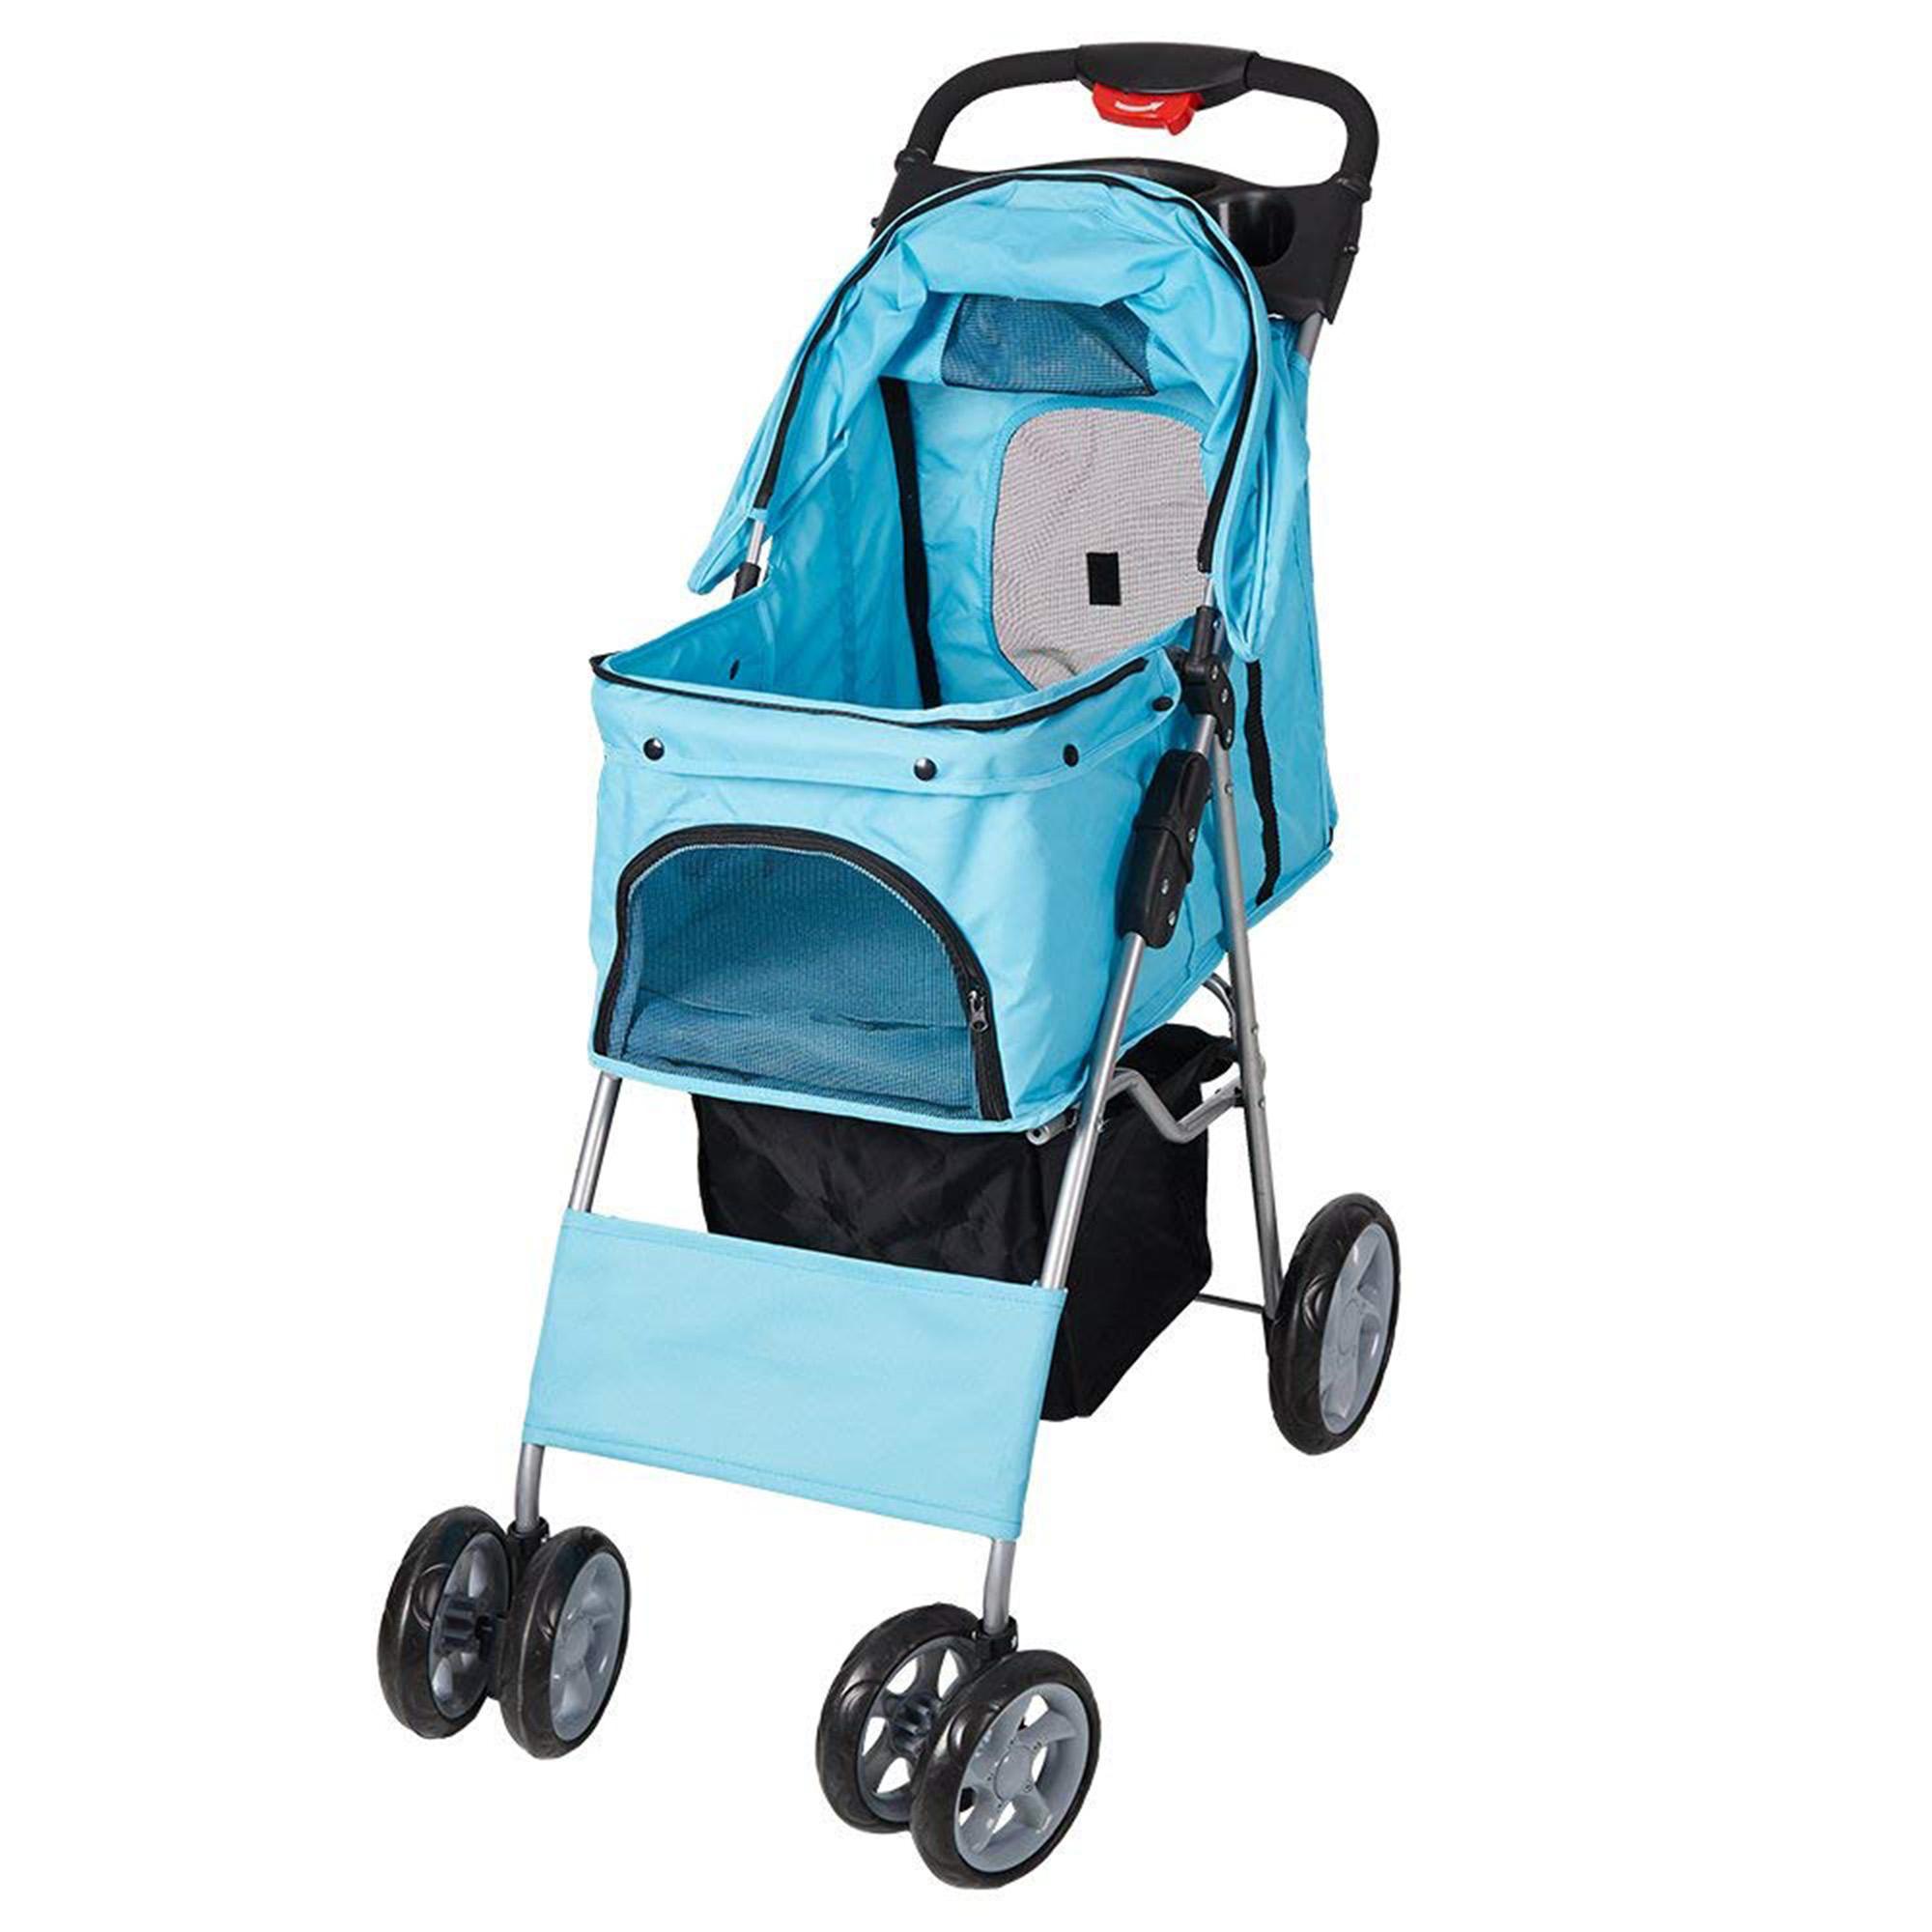 Karmas Product Pet Stroller Folding Pet Cat Carrier Travel Cart With Four Wheels, Black